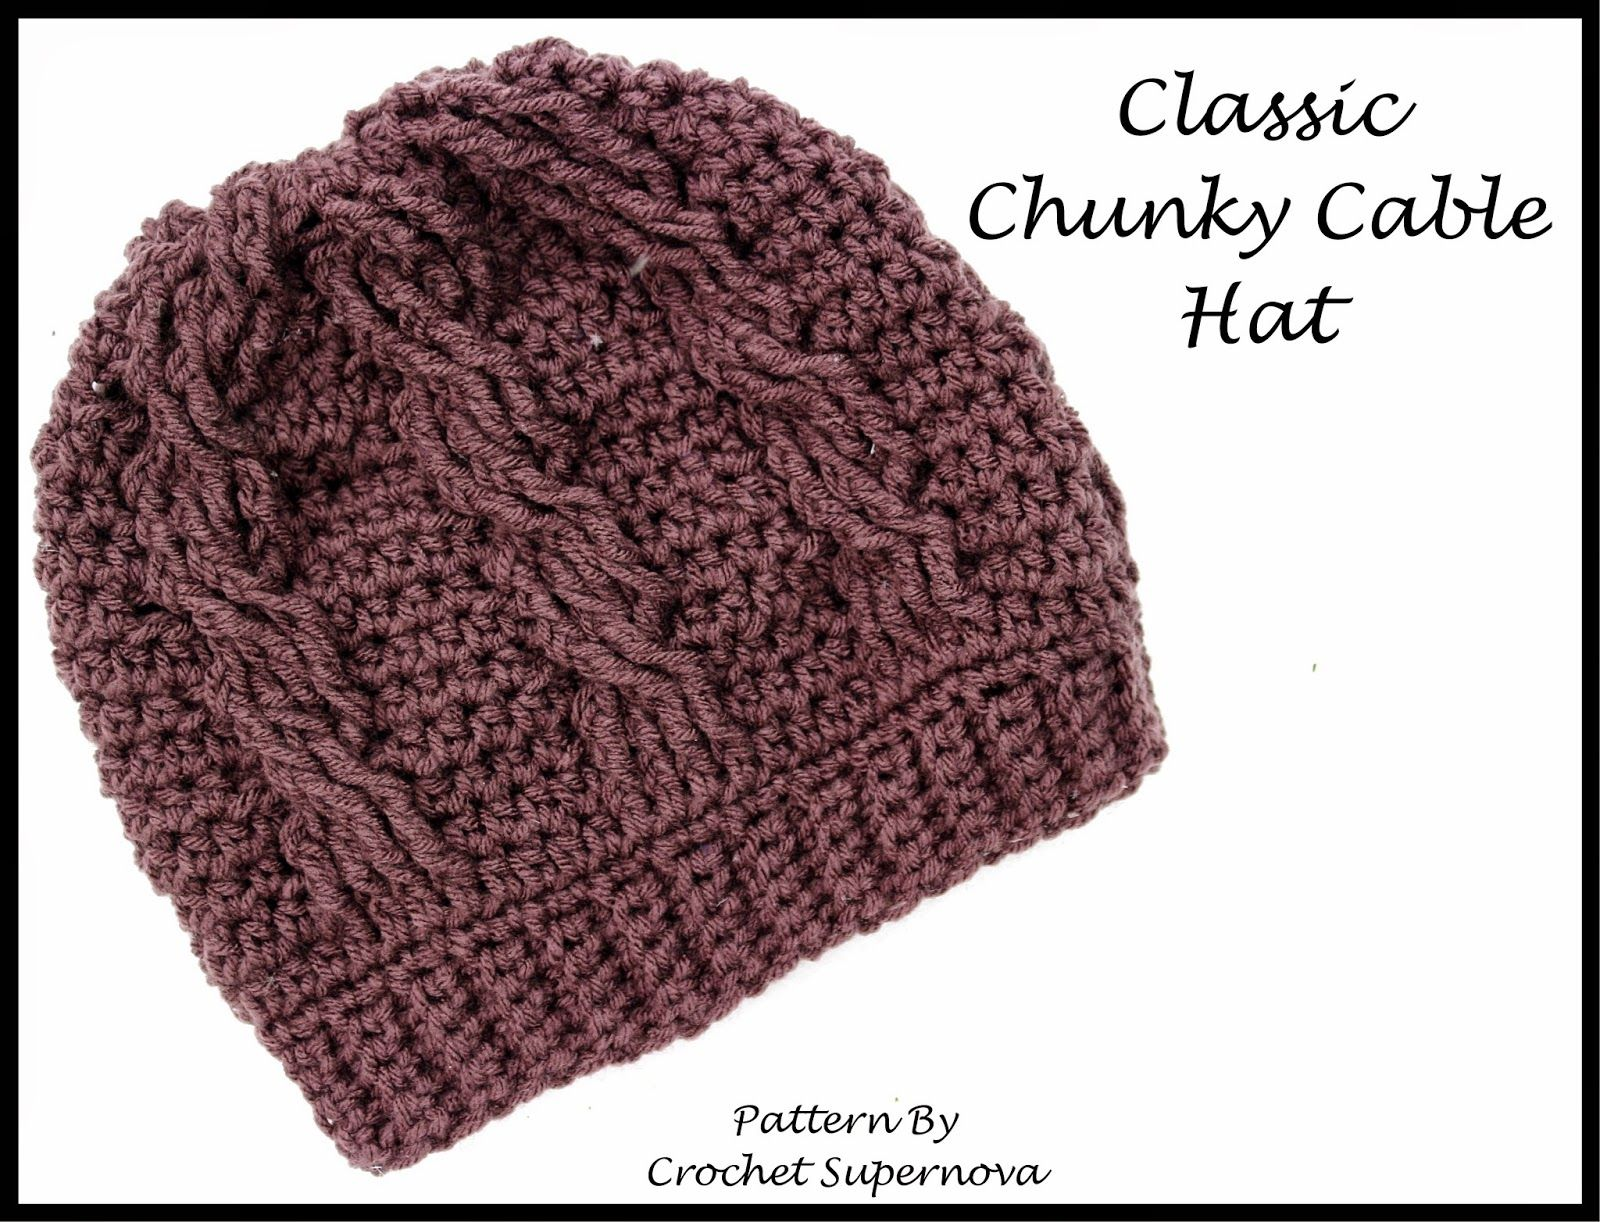 Crochet Supernova: Classic Chunky Cable Hat ~Free Pattern~ | Crochet ...